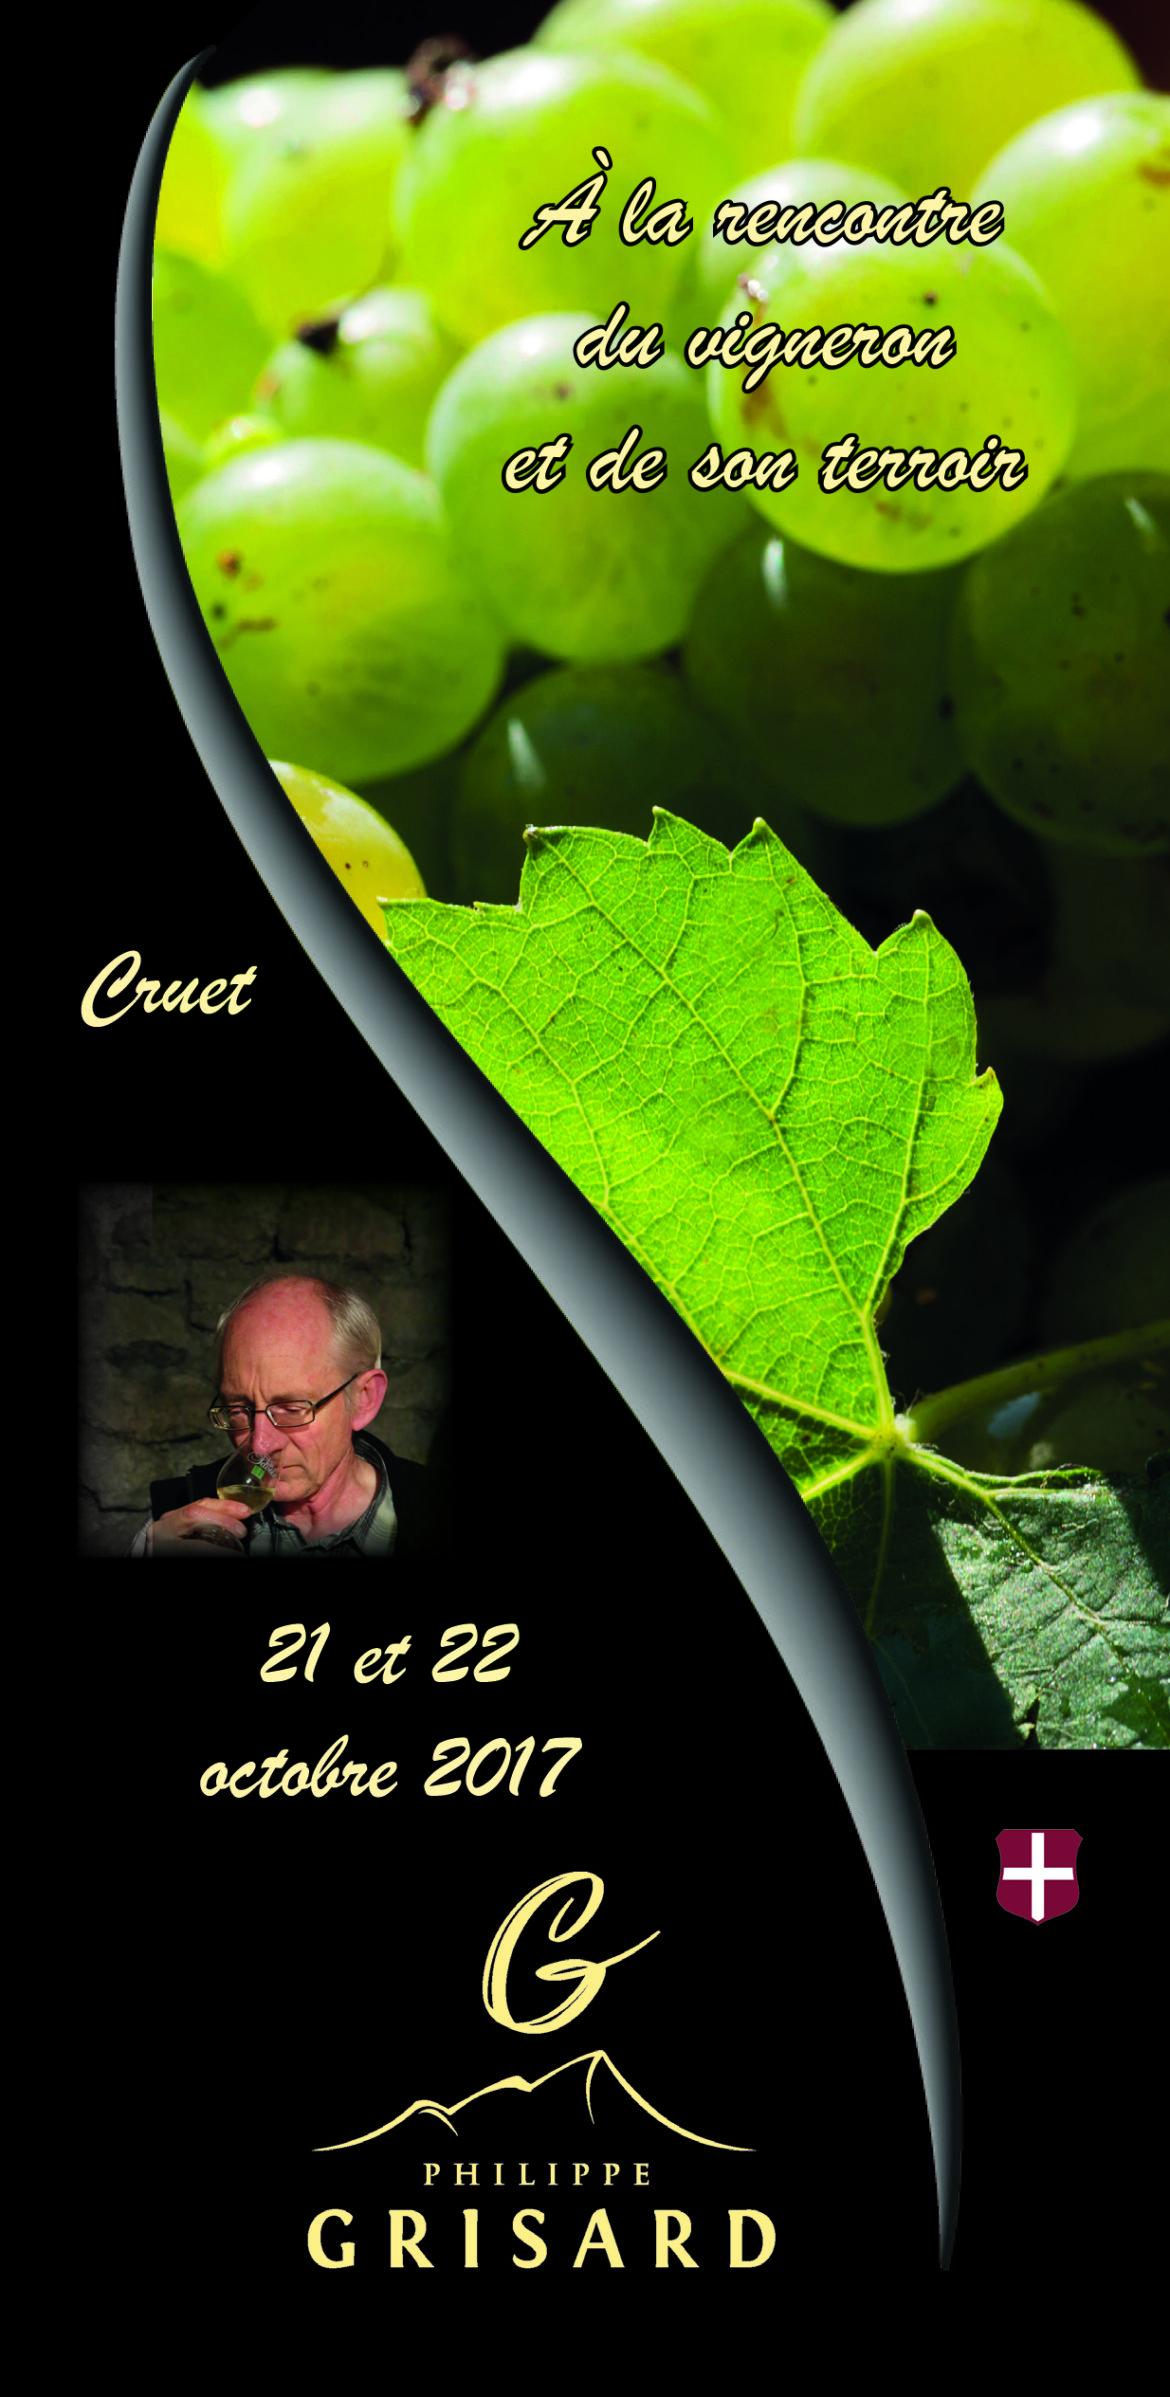 Invitation-PO-Grisard-2017-1.jpg